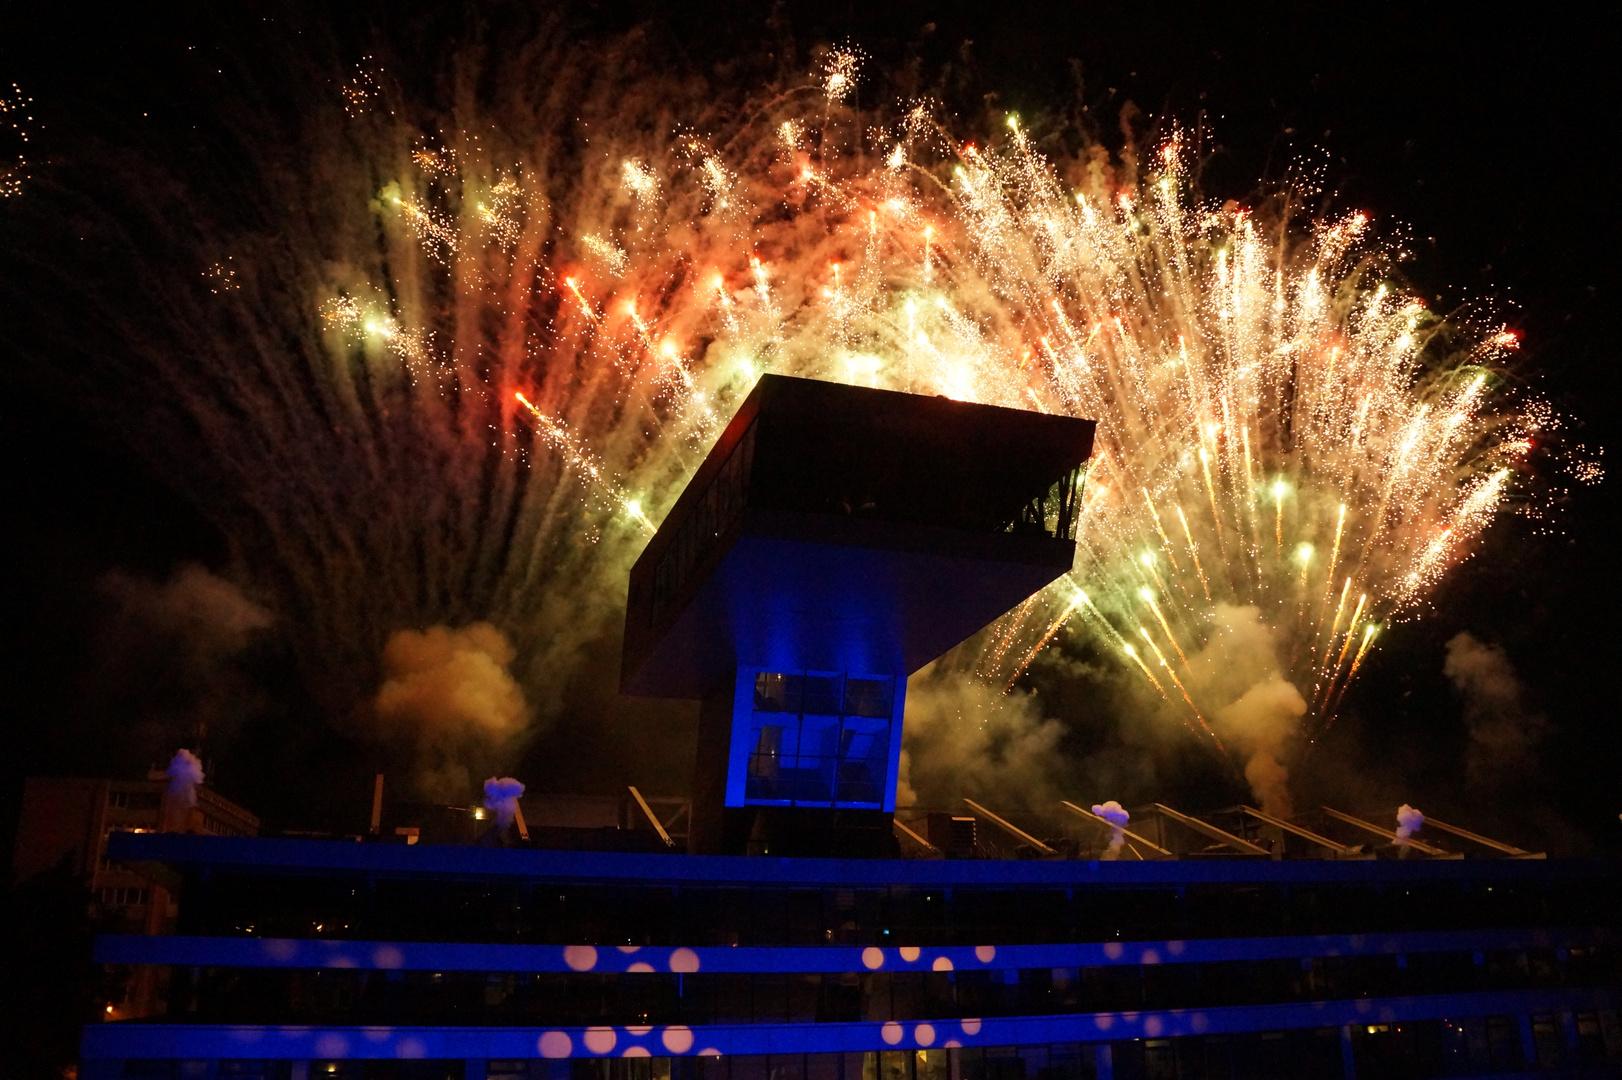 Feuerwerk in Lehen 2014